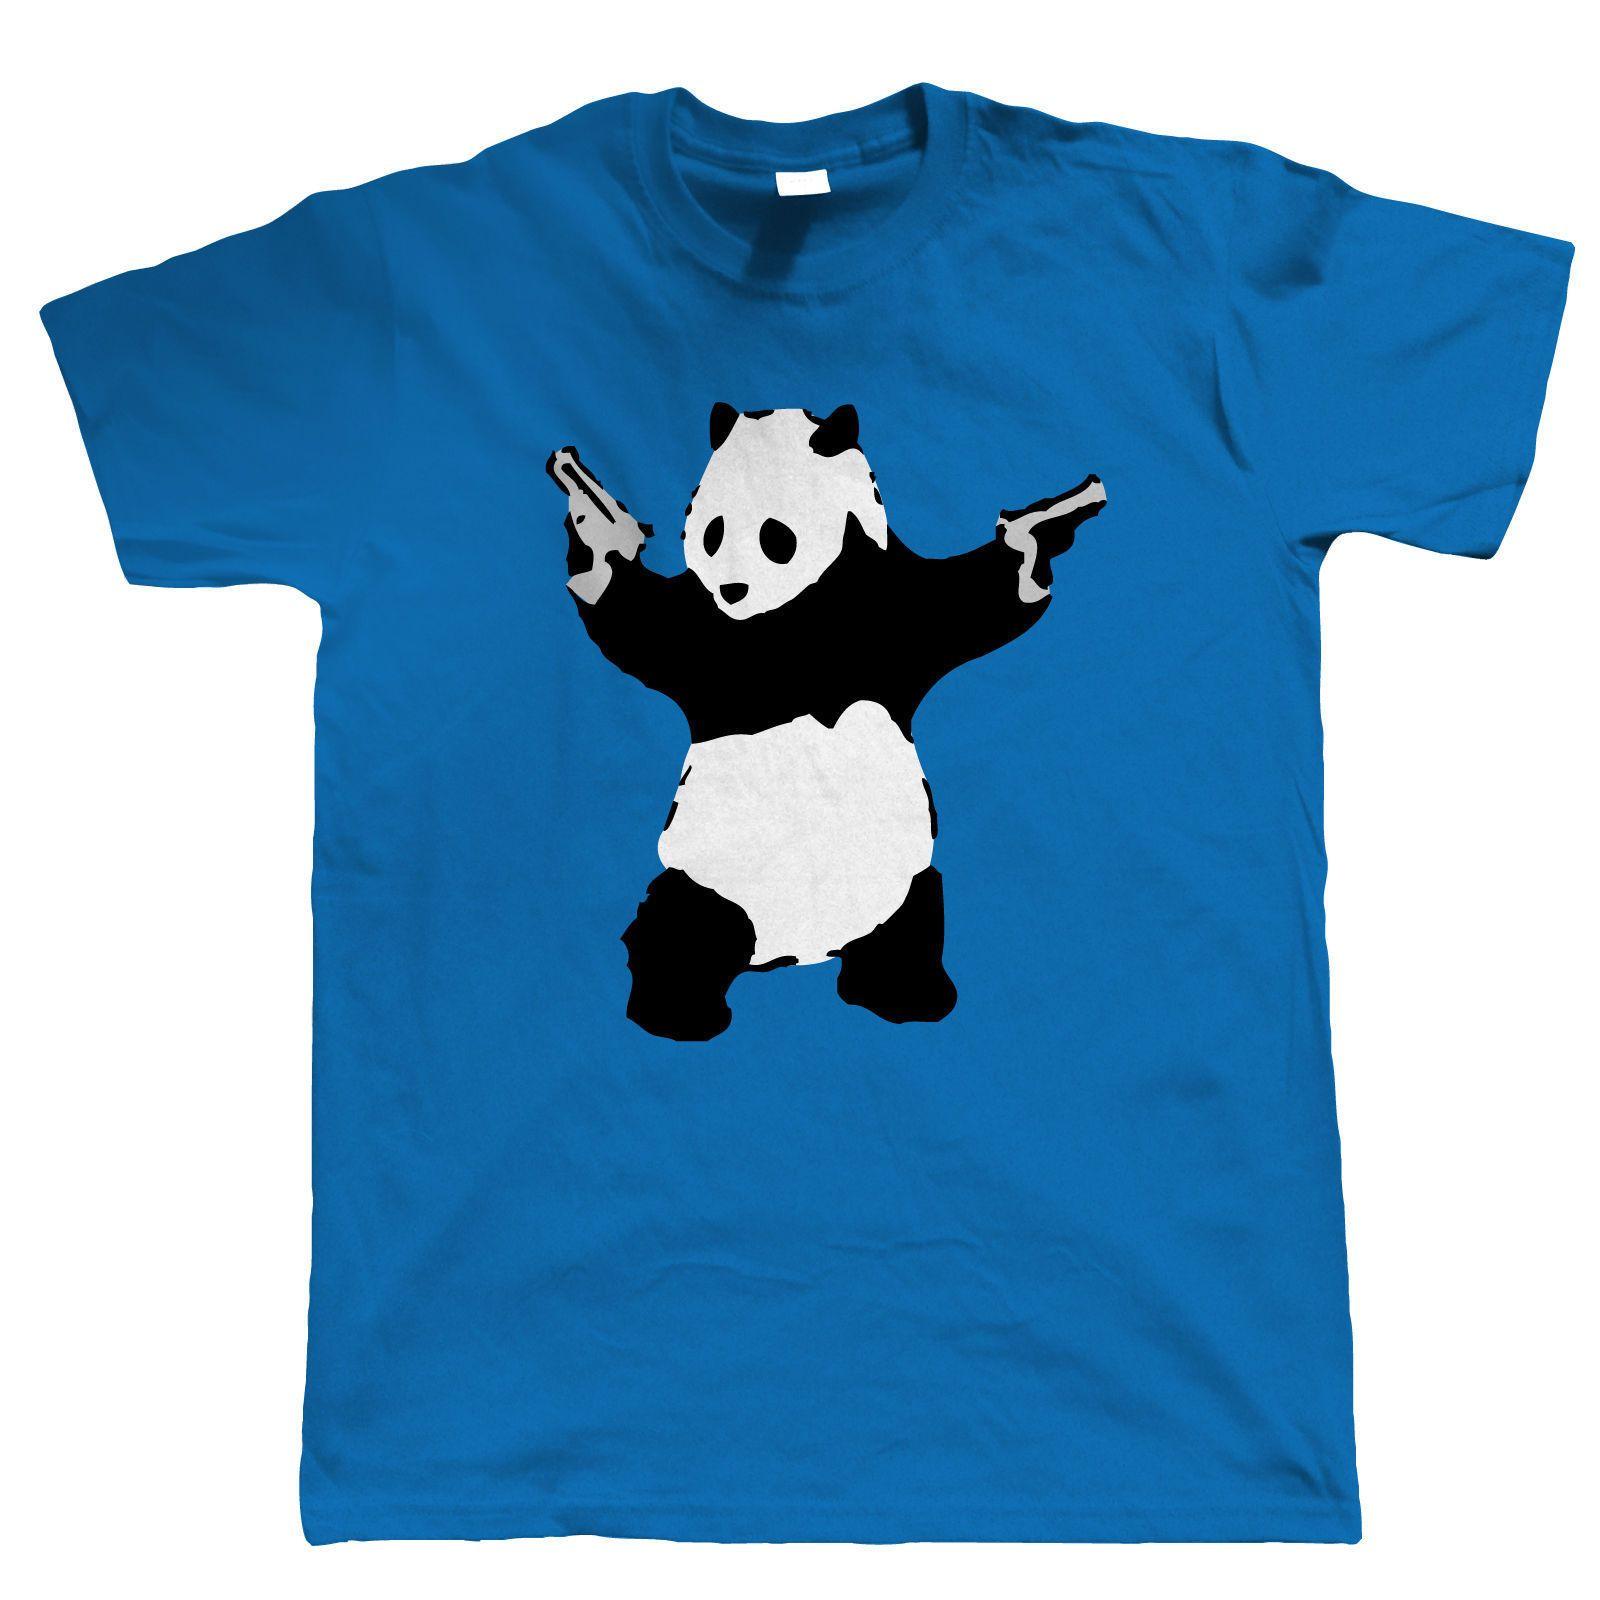 1aae9ddf Banksy, Panda With Guns, Mens Urban Art T Shirt Stock Clearance Mens 2018  Fashion Brand T Shirt O Neck T Shirts Buy Shirt T From Temperamenttee, ...